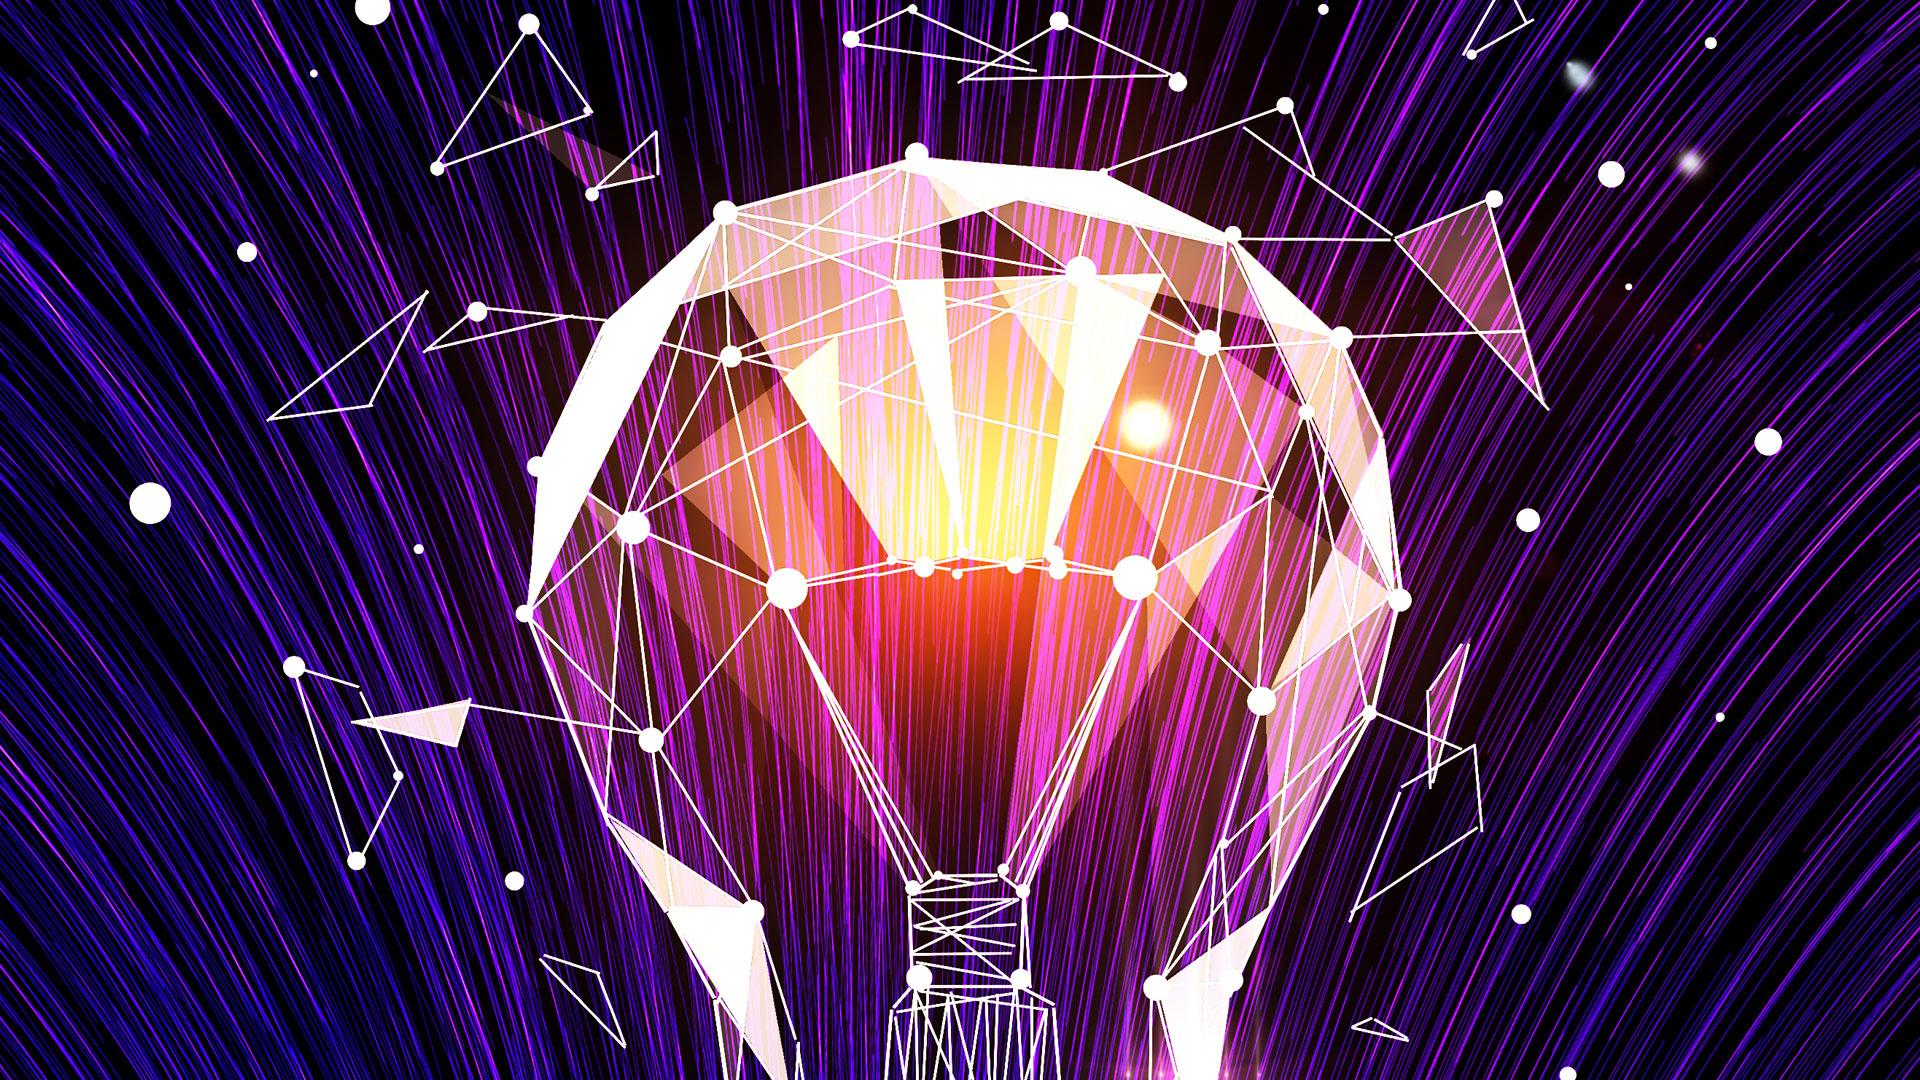 1-innovation-images-website-1920x1080